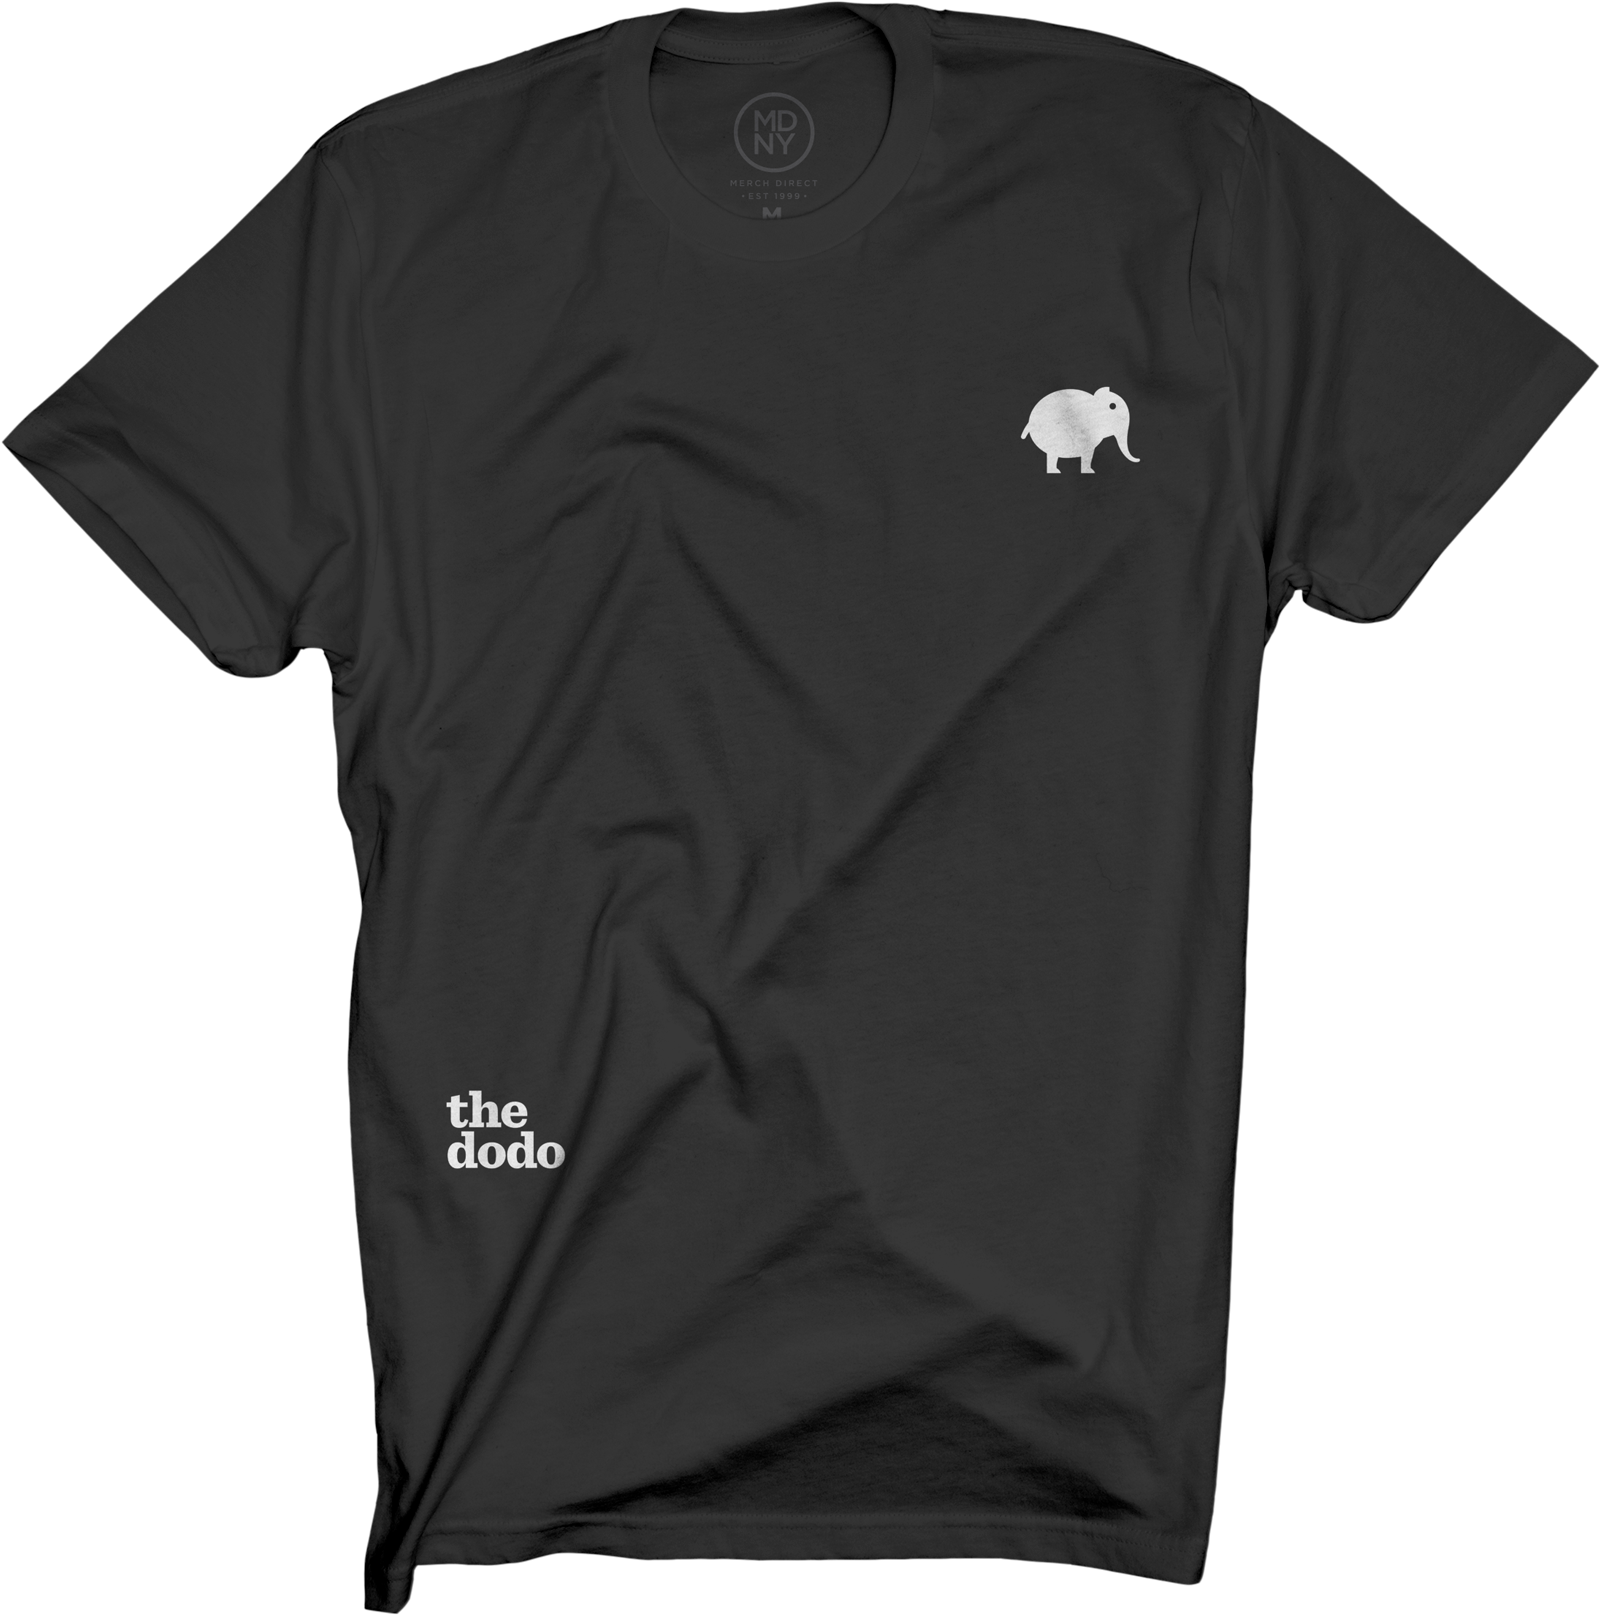 Dodo Friends Tee - Elephant/Black